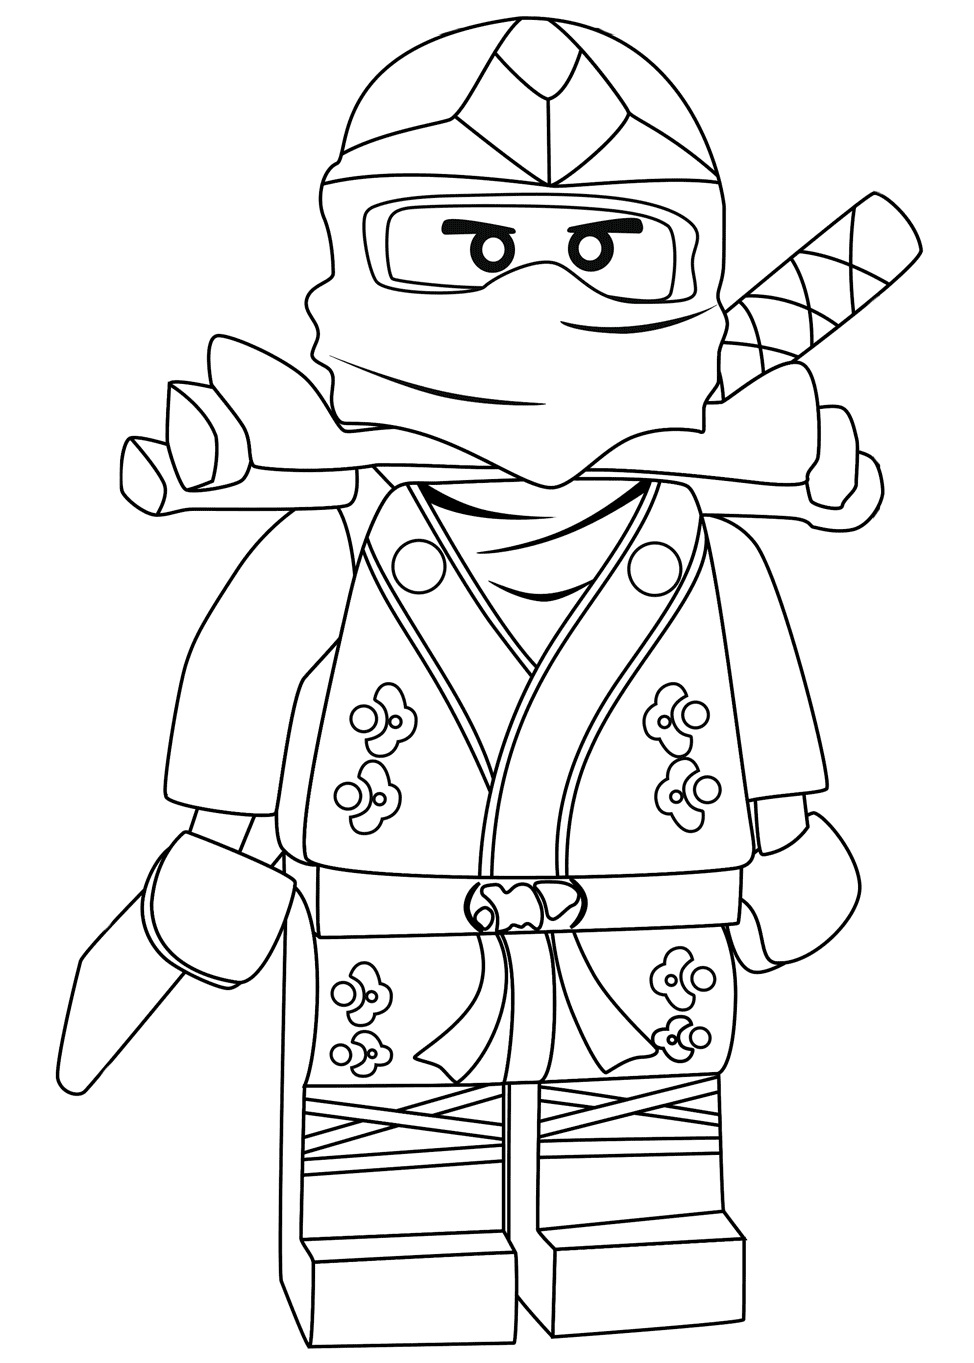 Lego Ninjago Grner Ninja Ausmalbilder Ausmalbilder Webpage